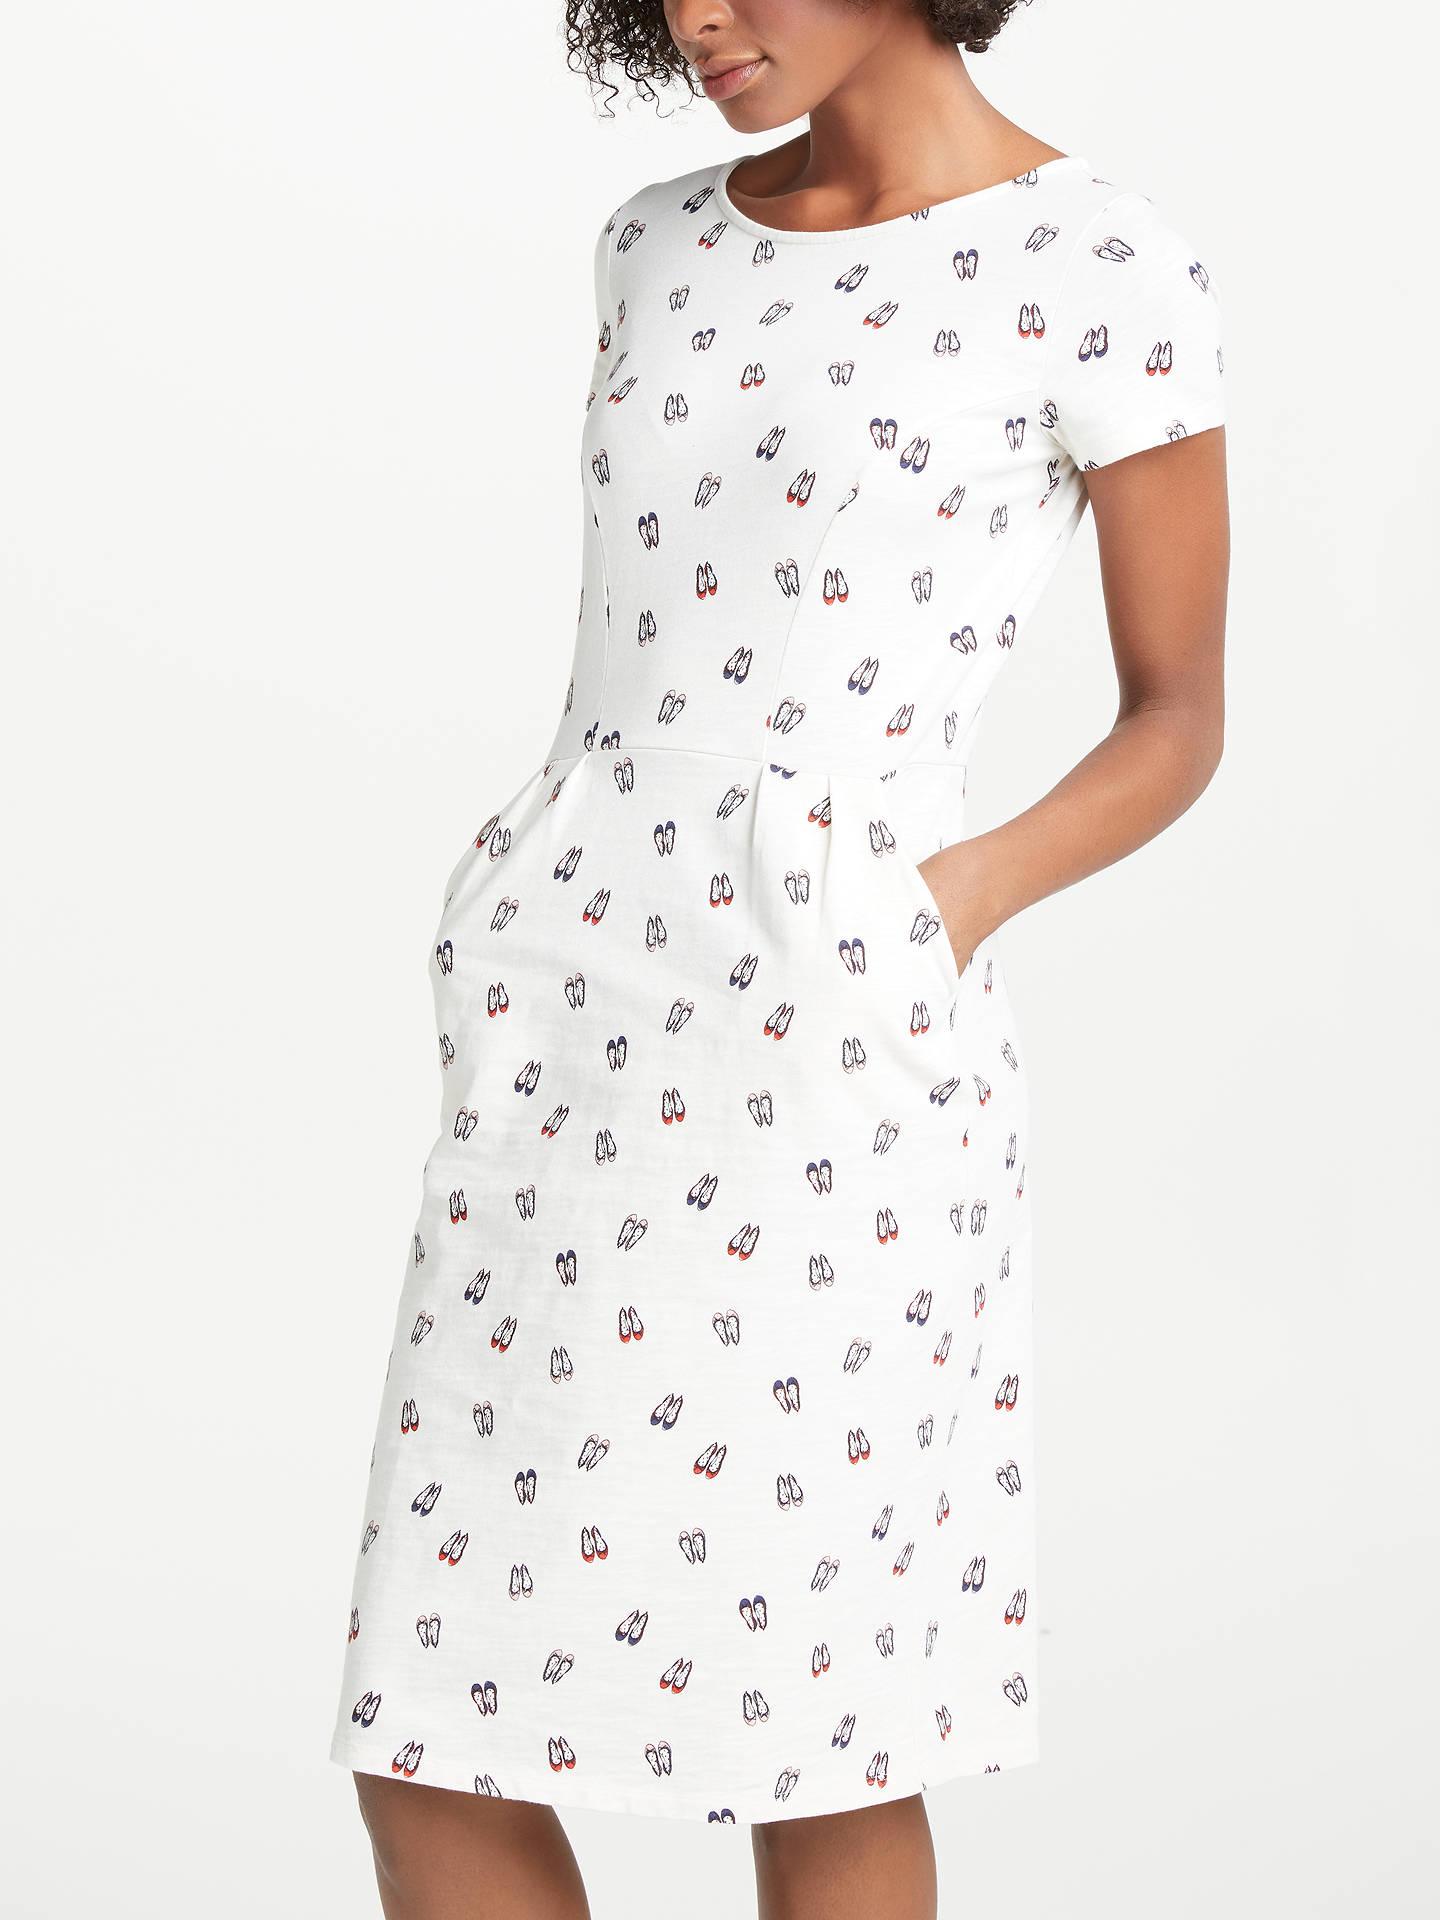 48faaf17 Buy Boden Phoebe Jersey Dress, Ecru Ballet Slippers, 8 Online at  johnlewis.com ...